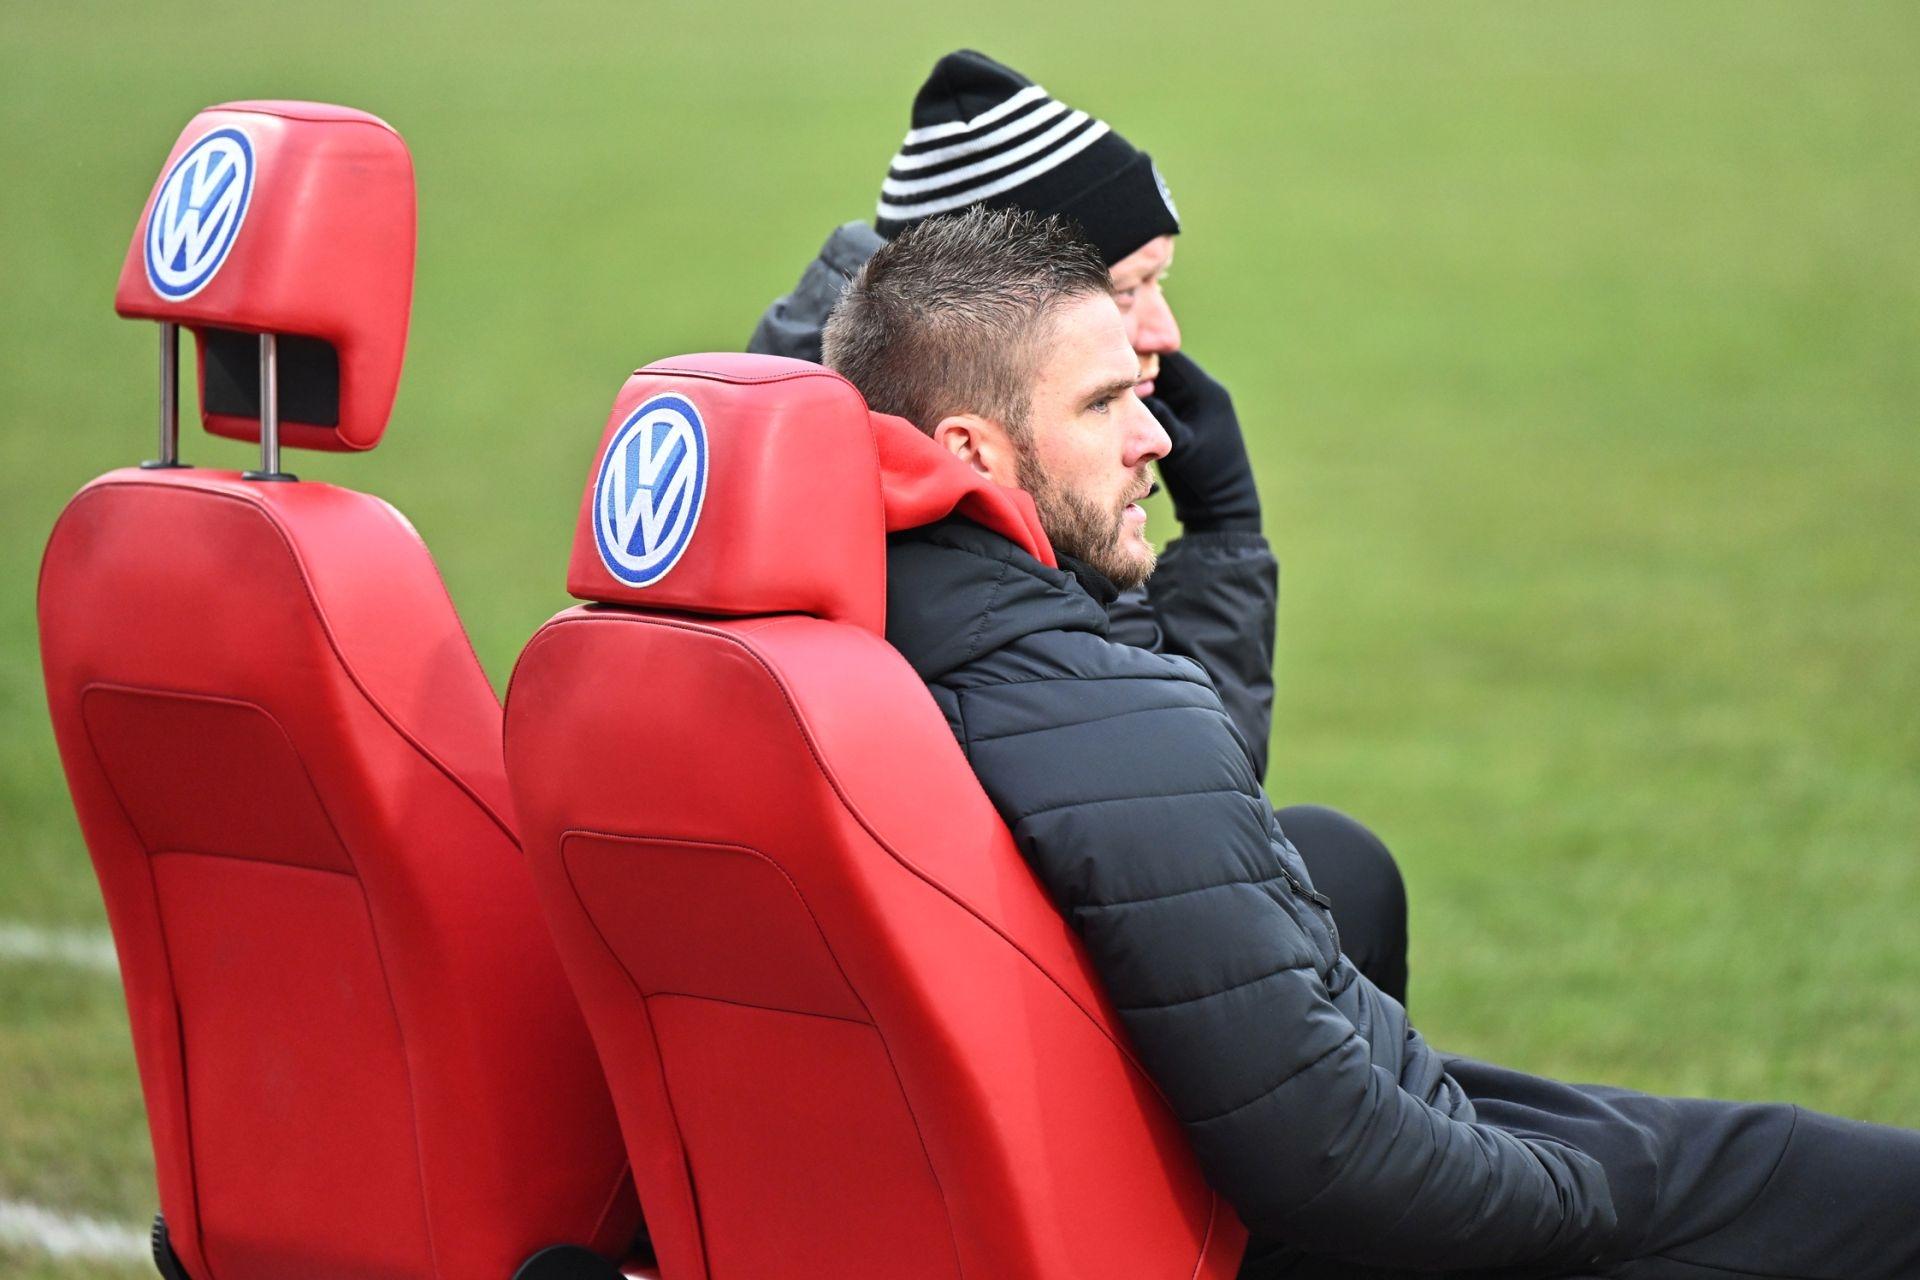 Regionalliga S�dwest 2020/21, KSV Hessen Kassel, SG Sonnenhof Grossaspach, Endstand 0:2, Tobias Damm, Sebastian Busch